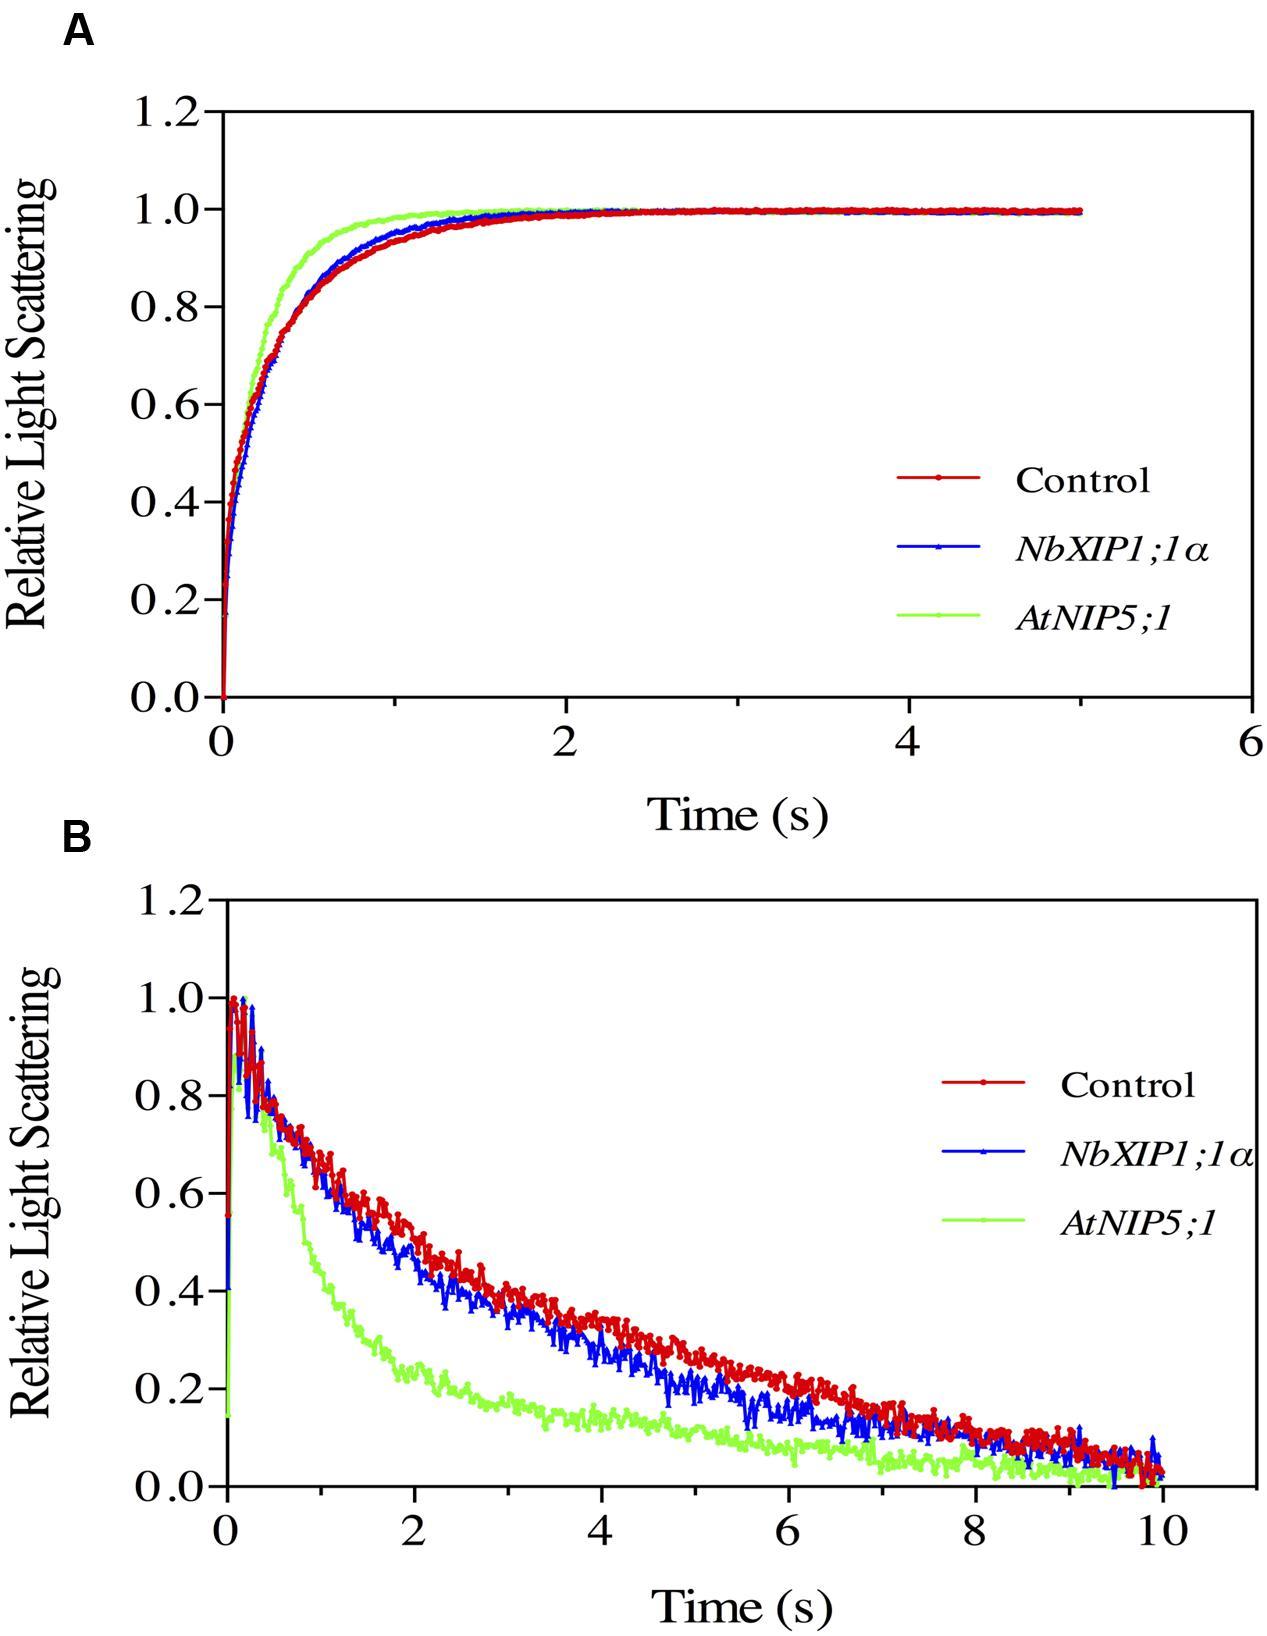 Frontiers | The Aquaporin Splice Variant NbXIP1